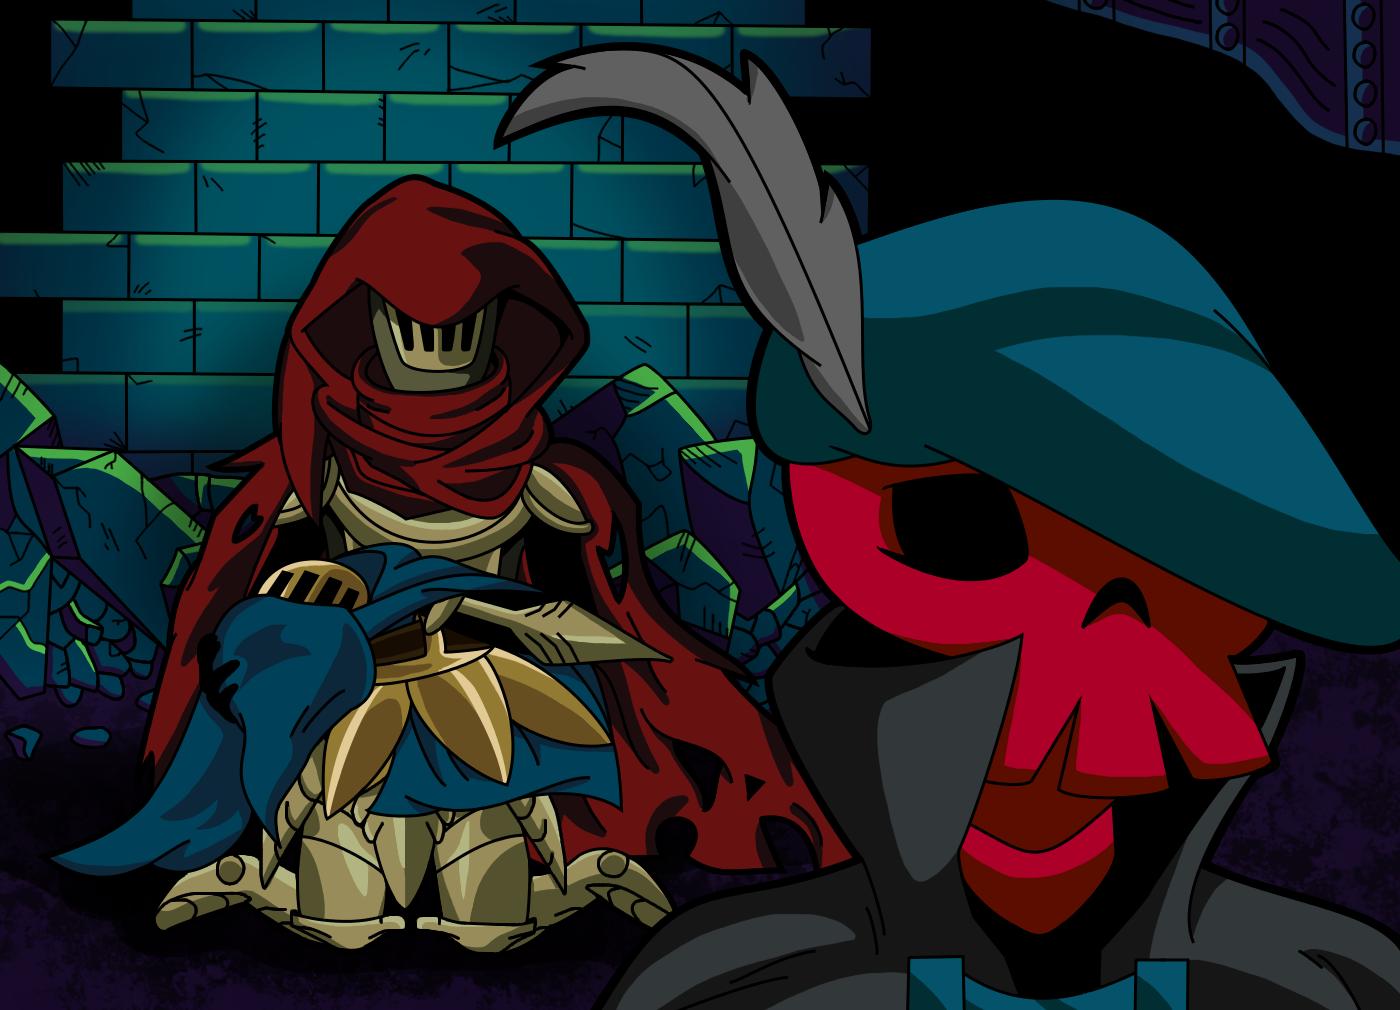 Grieving The Past Shovel Knight By Kingshovelton On Deviantart